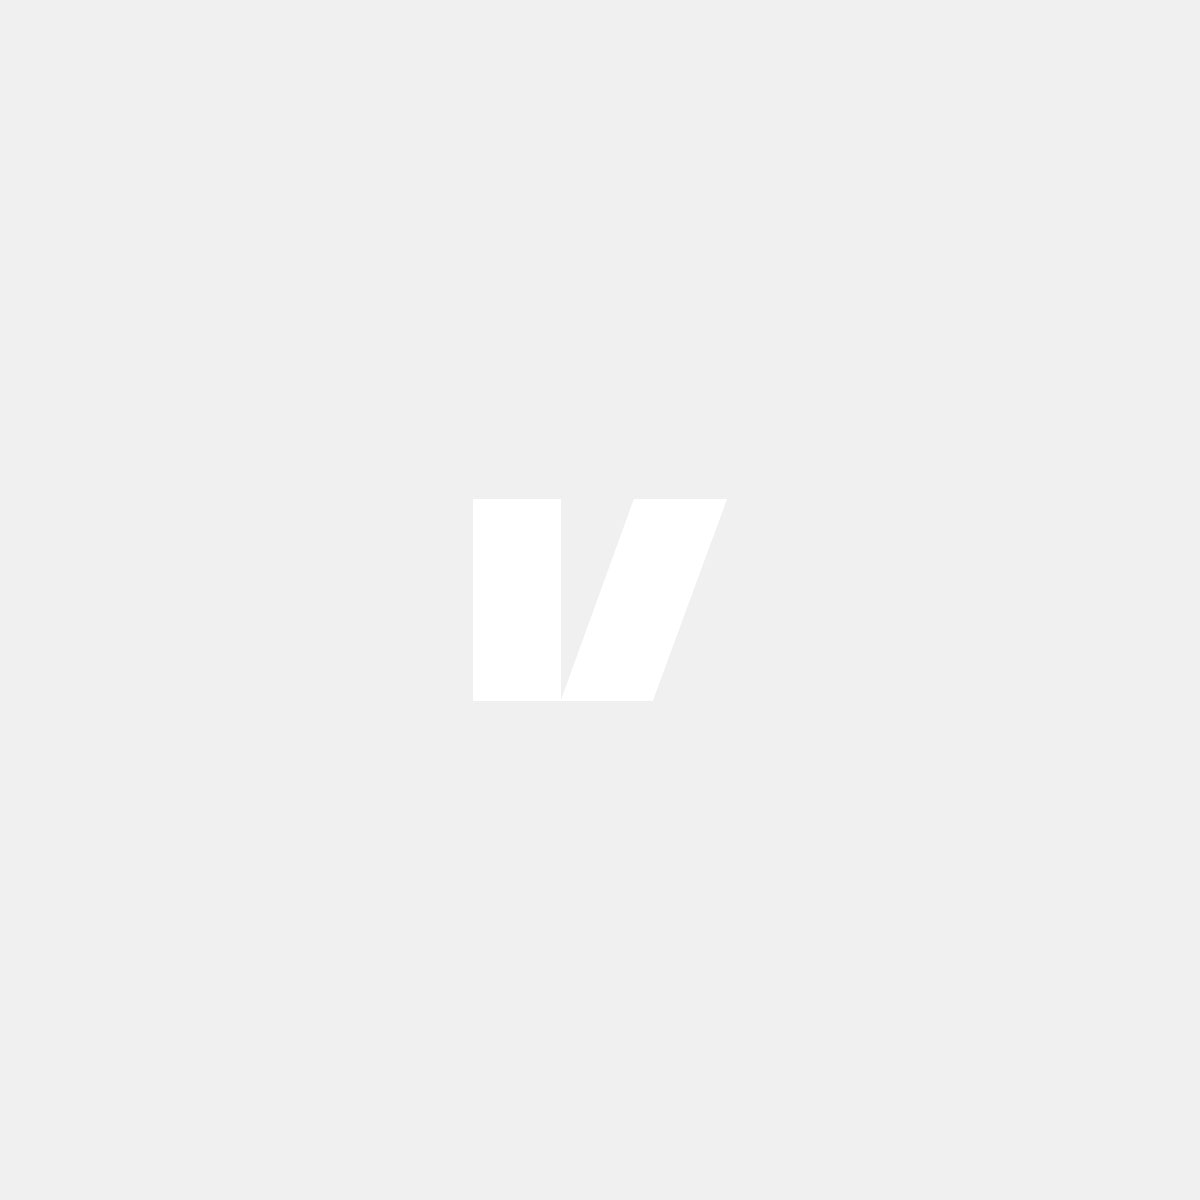 Svarta stylingspegelblinkers till Volvo C30, C70, S40, S60, S80, V50, V70